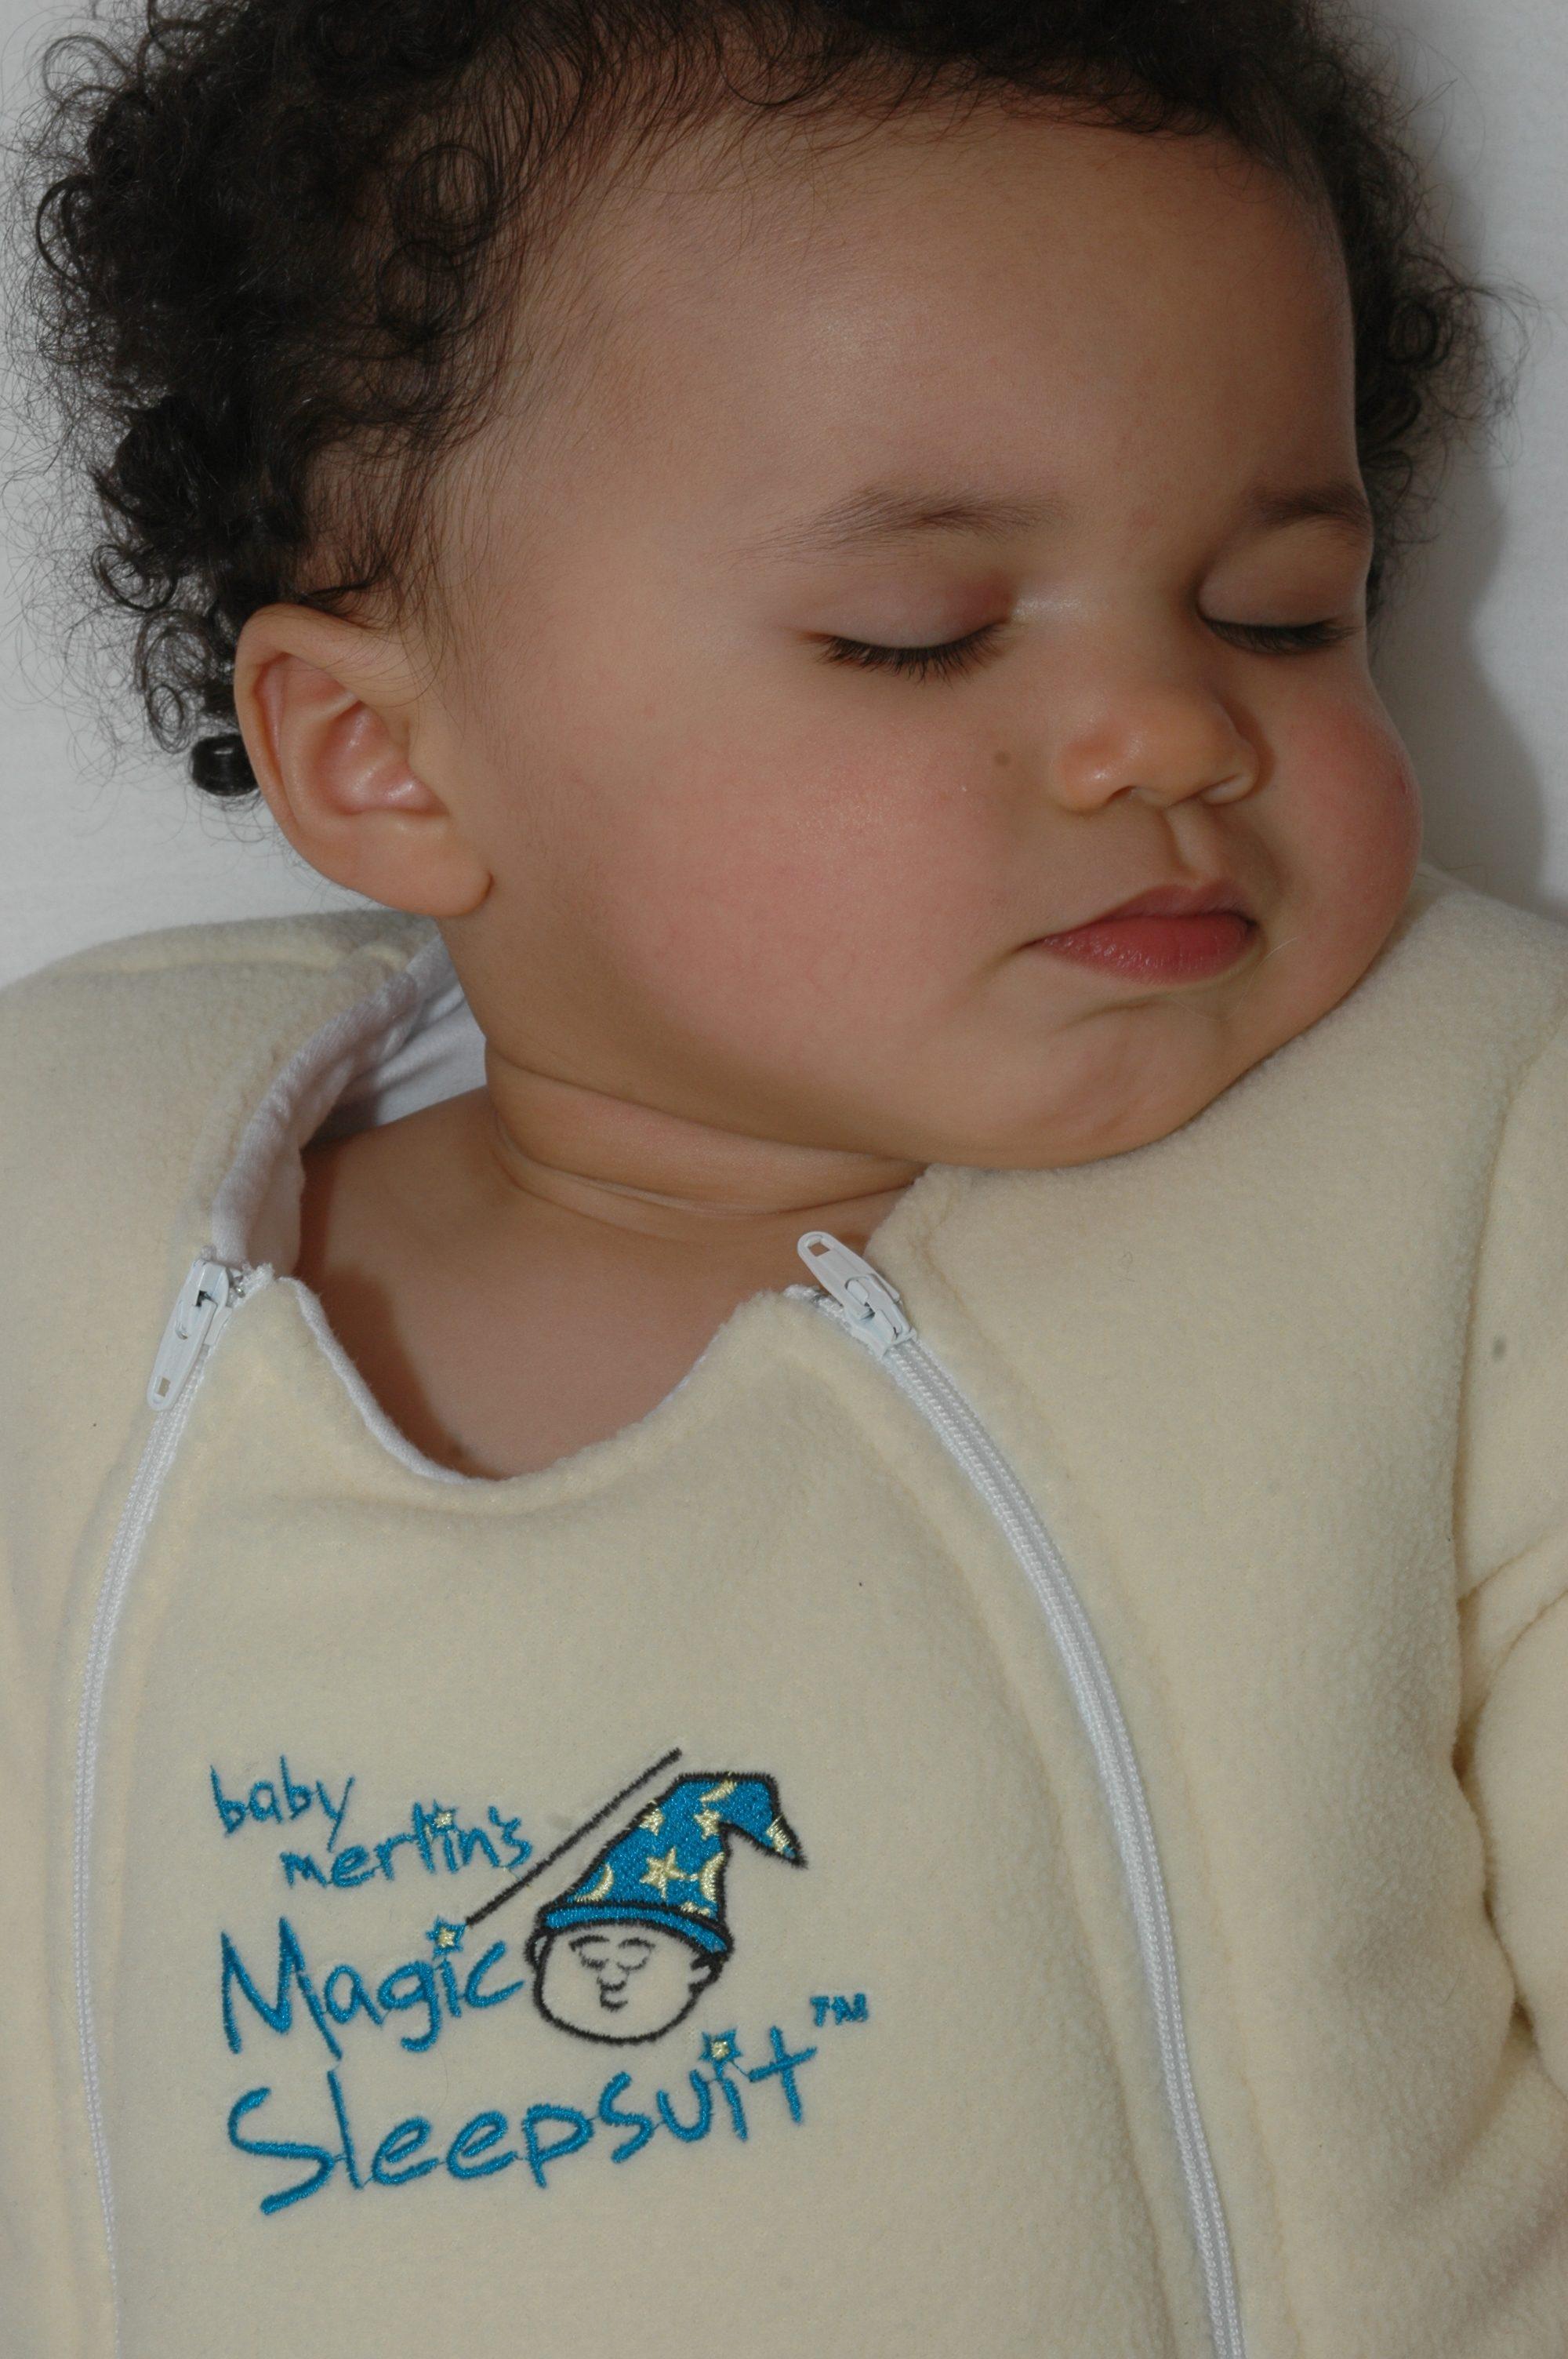 Baby wearing magic sleepsuit lemon colour